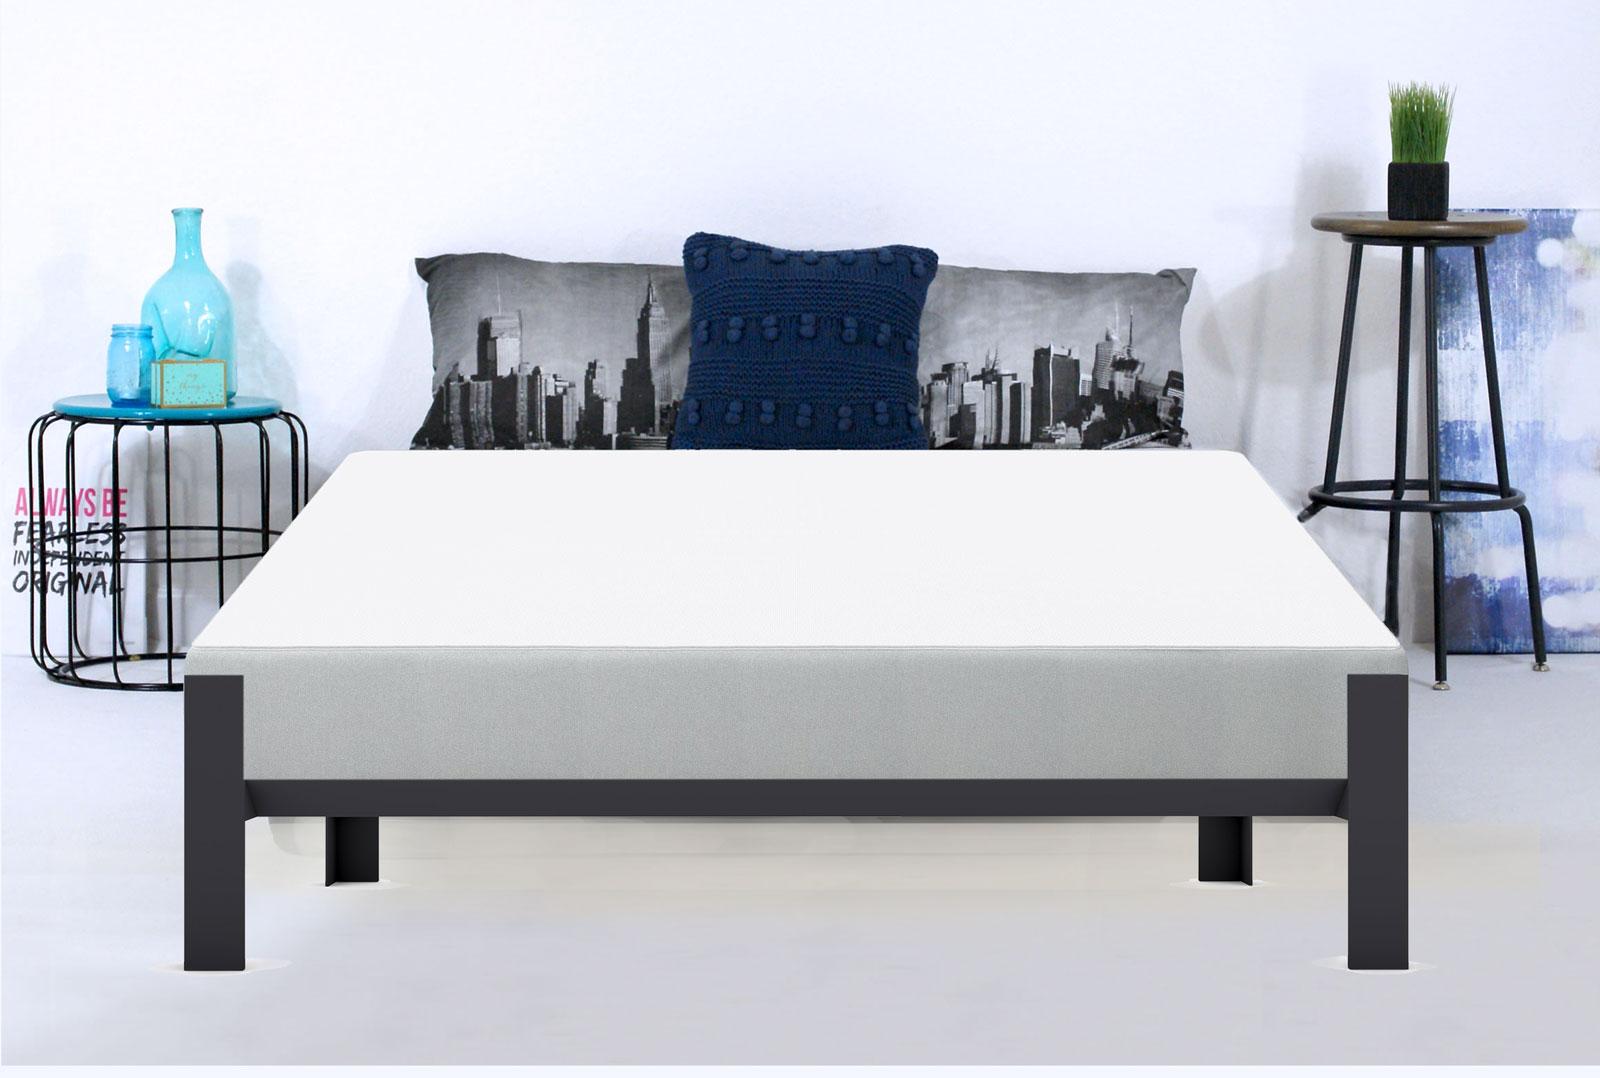 getmyfin-fin10-fin-mattress-style.jpg